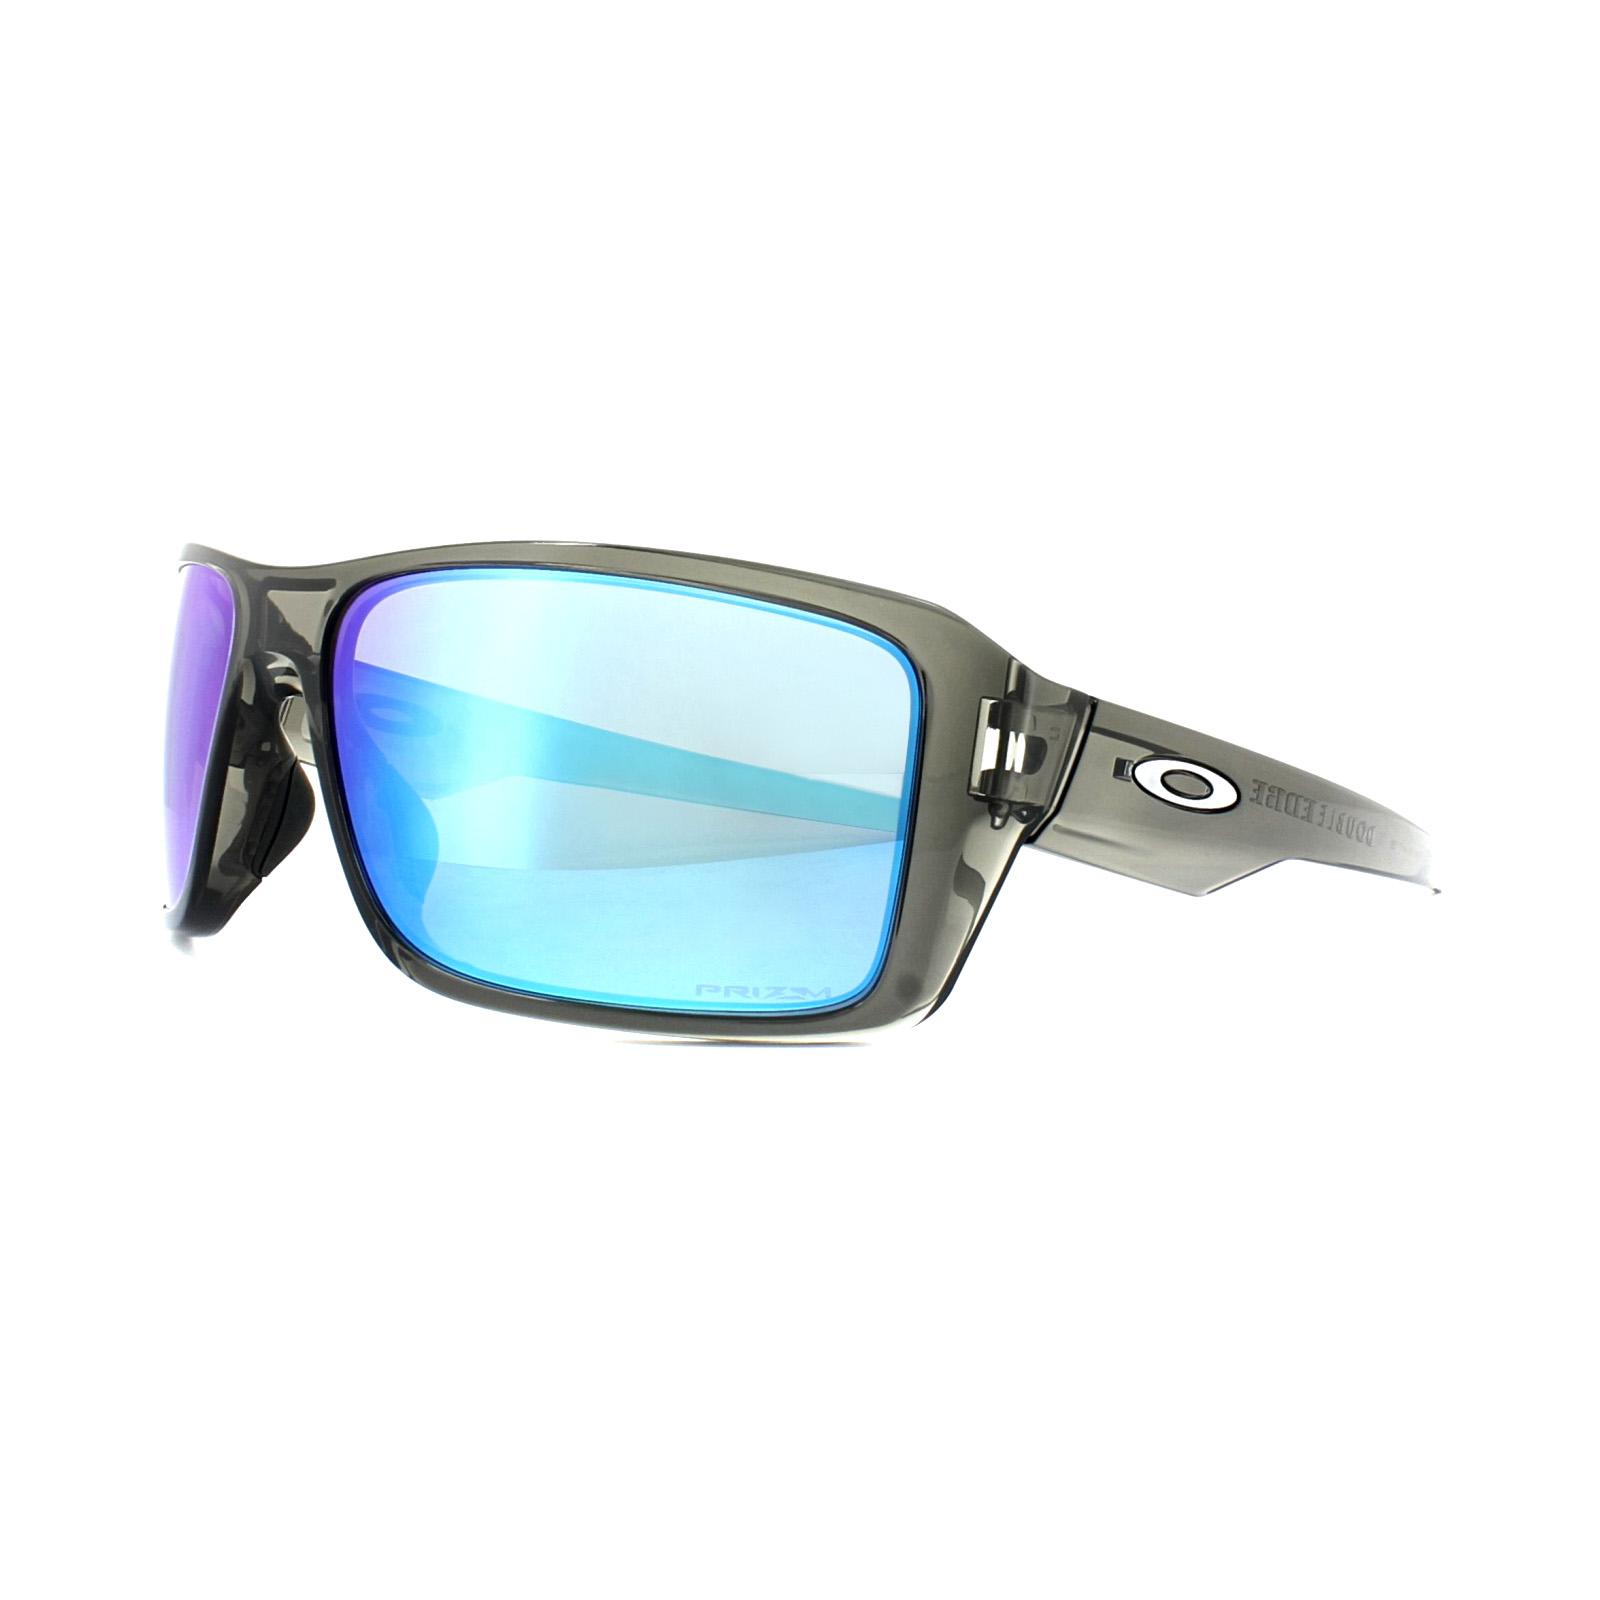 b54ef932f Sentinel Oakley Sunglasses Double Edge OO9380-06 Grey Smoke Prizm Sapphire  Polarized